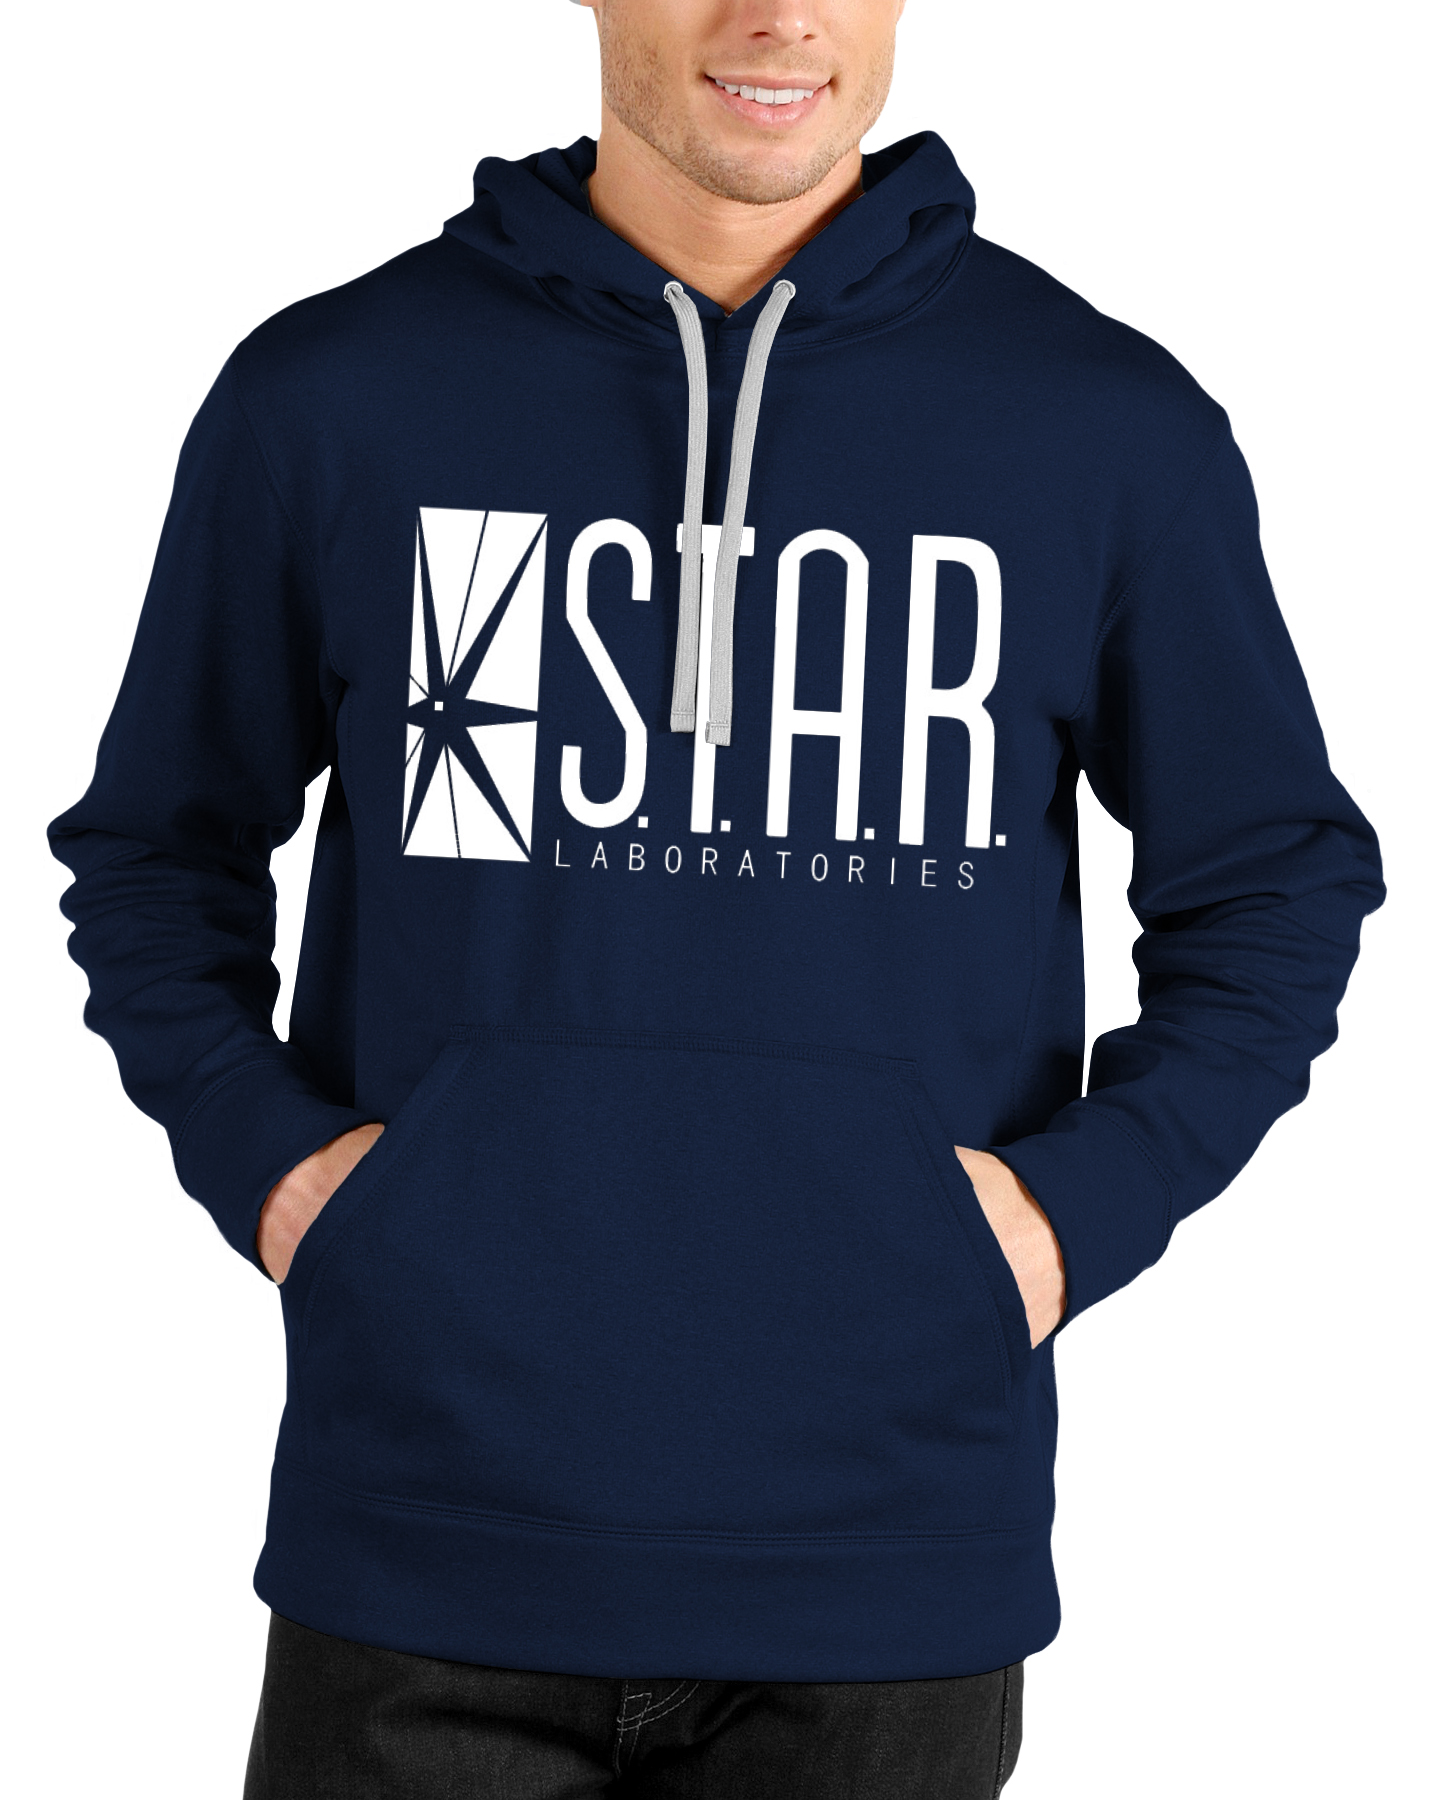 Star Laboratories Navy Blue Hoodie  265c793100a